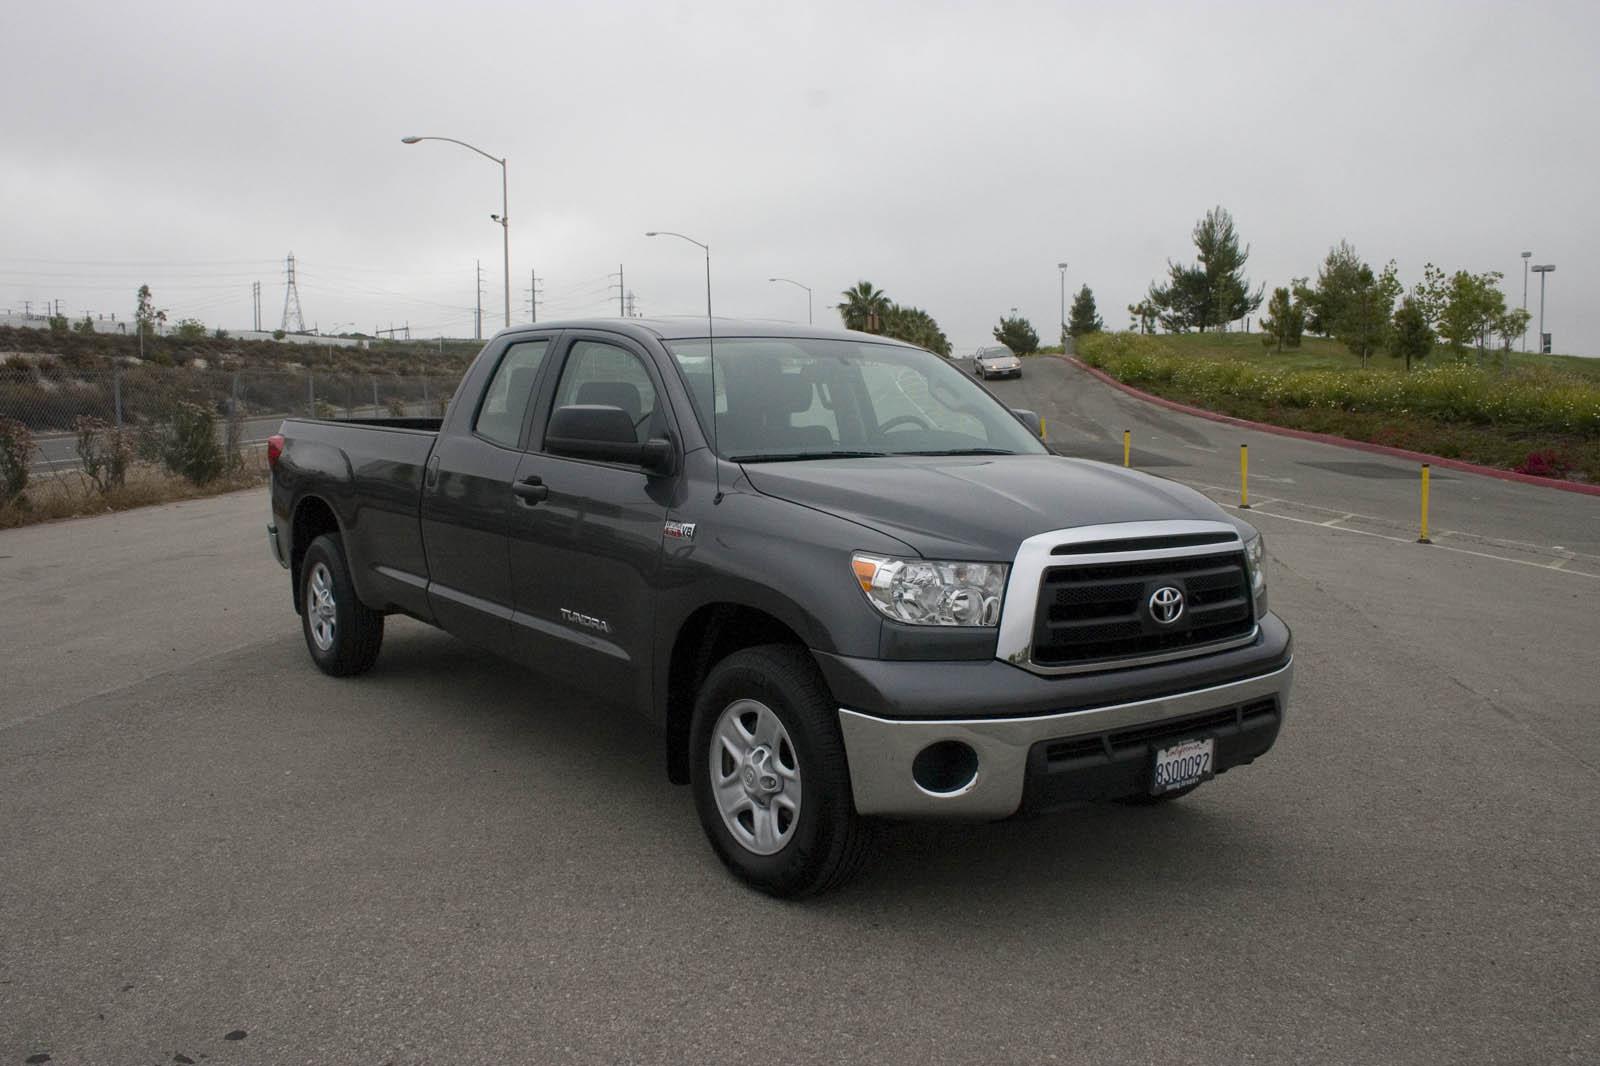 2011 Toyota Tundra Image 18